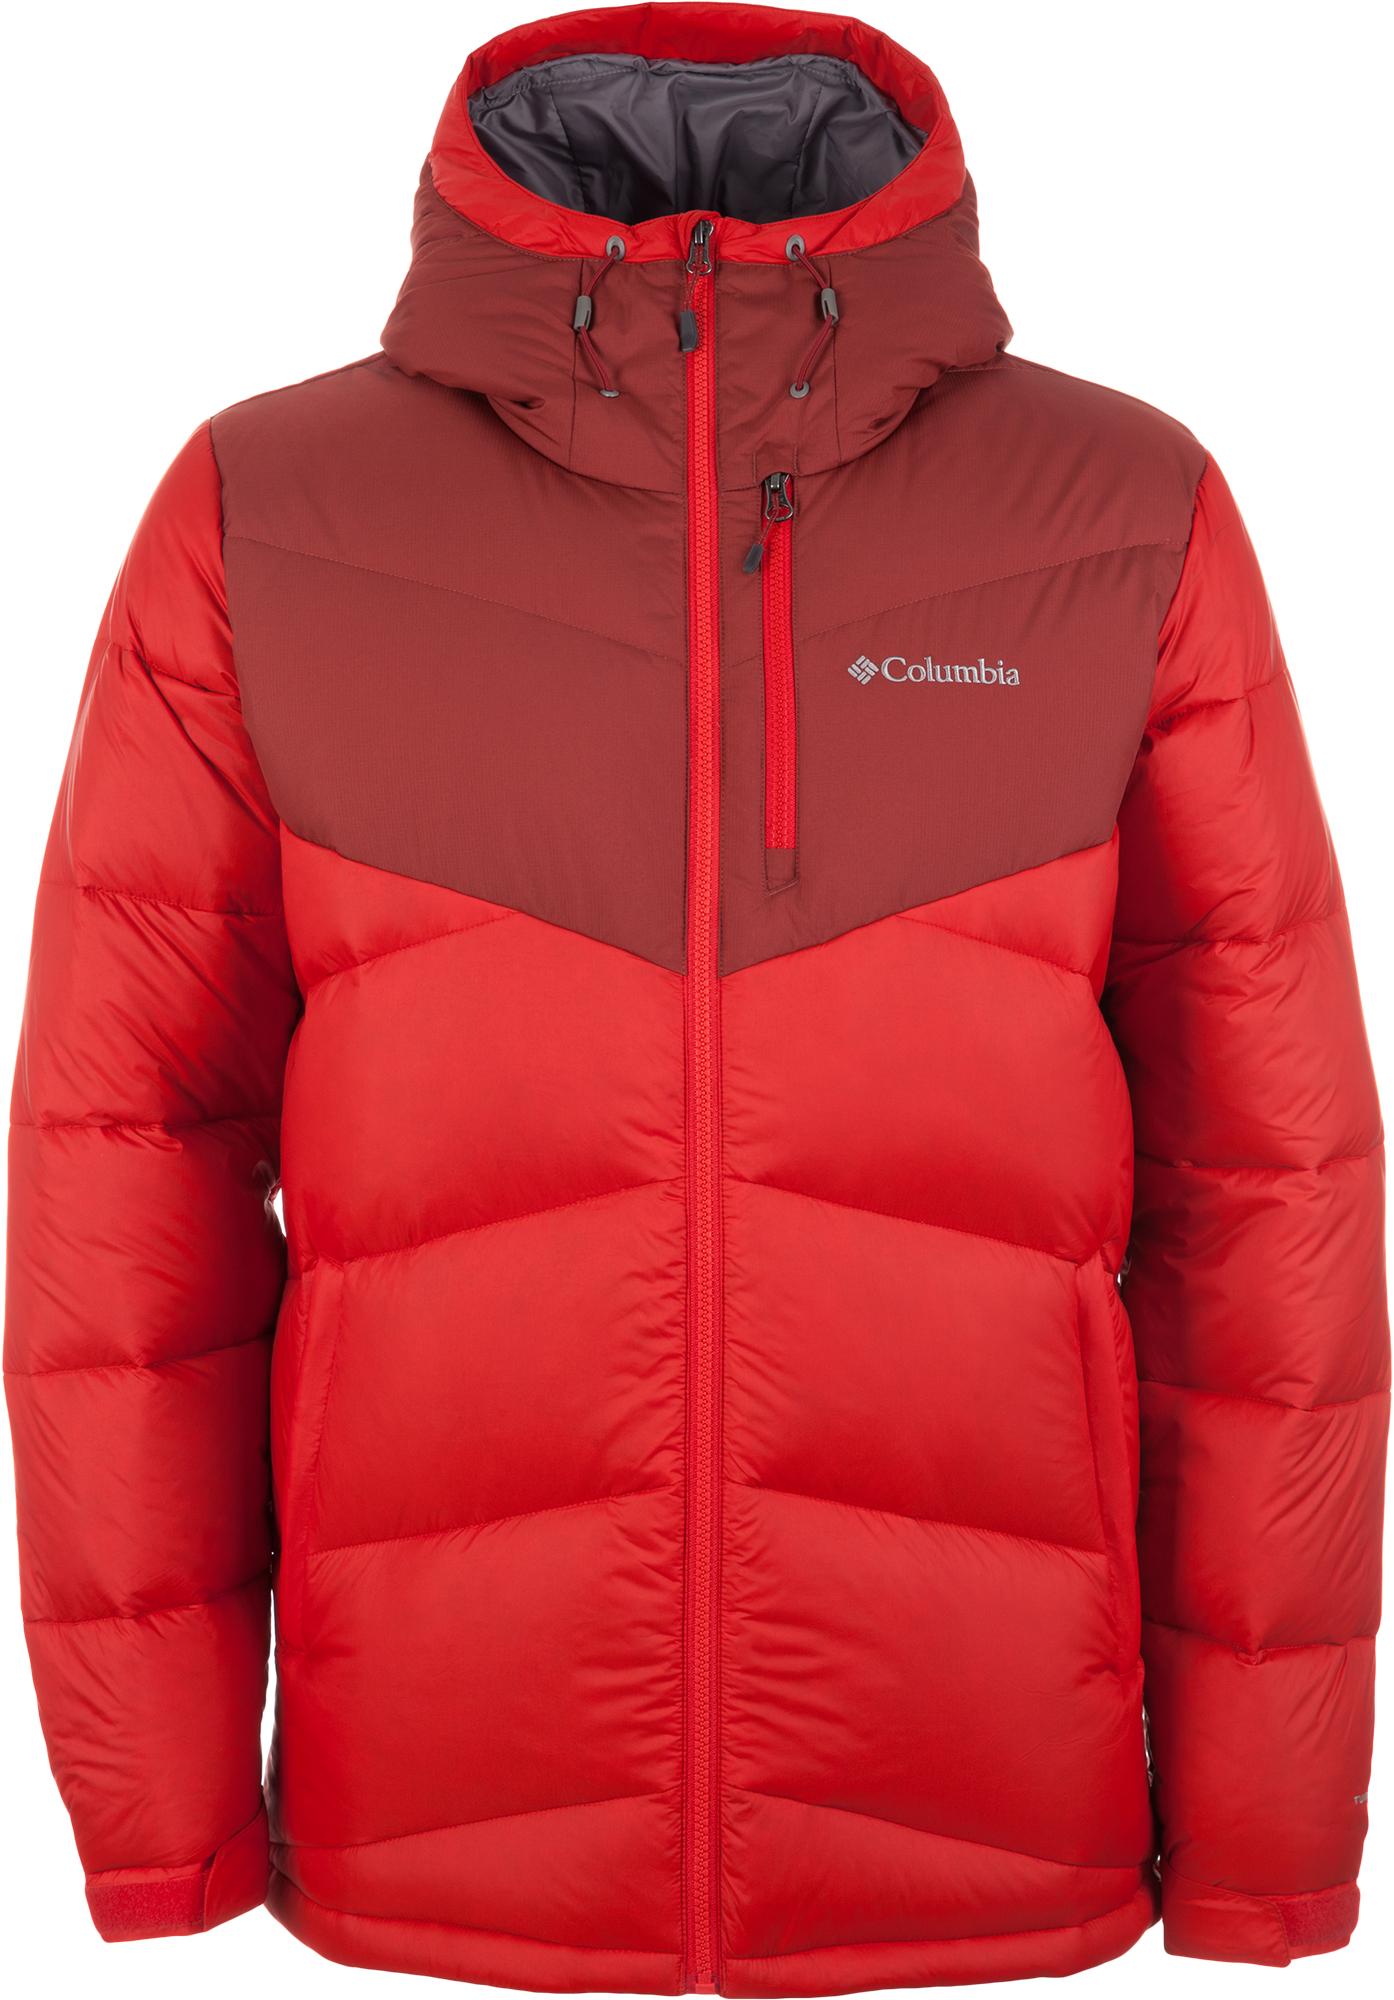 Columbia Куртка пуховая мужская Columbia Sylvan Lake II 630 TurboDown, размер 58-60 цены